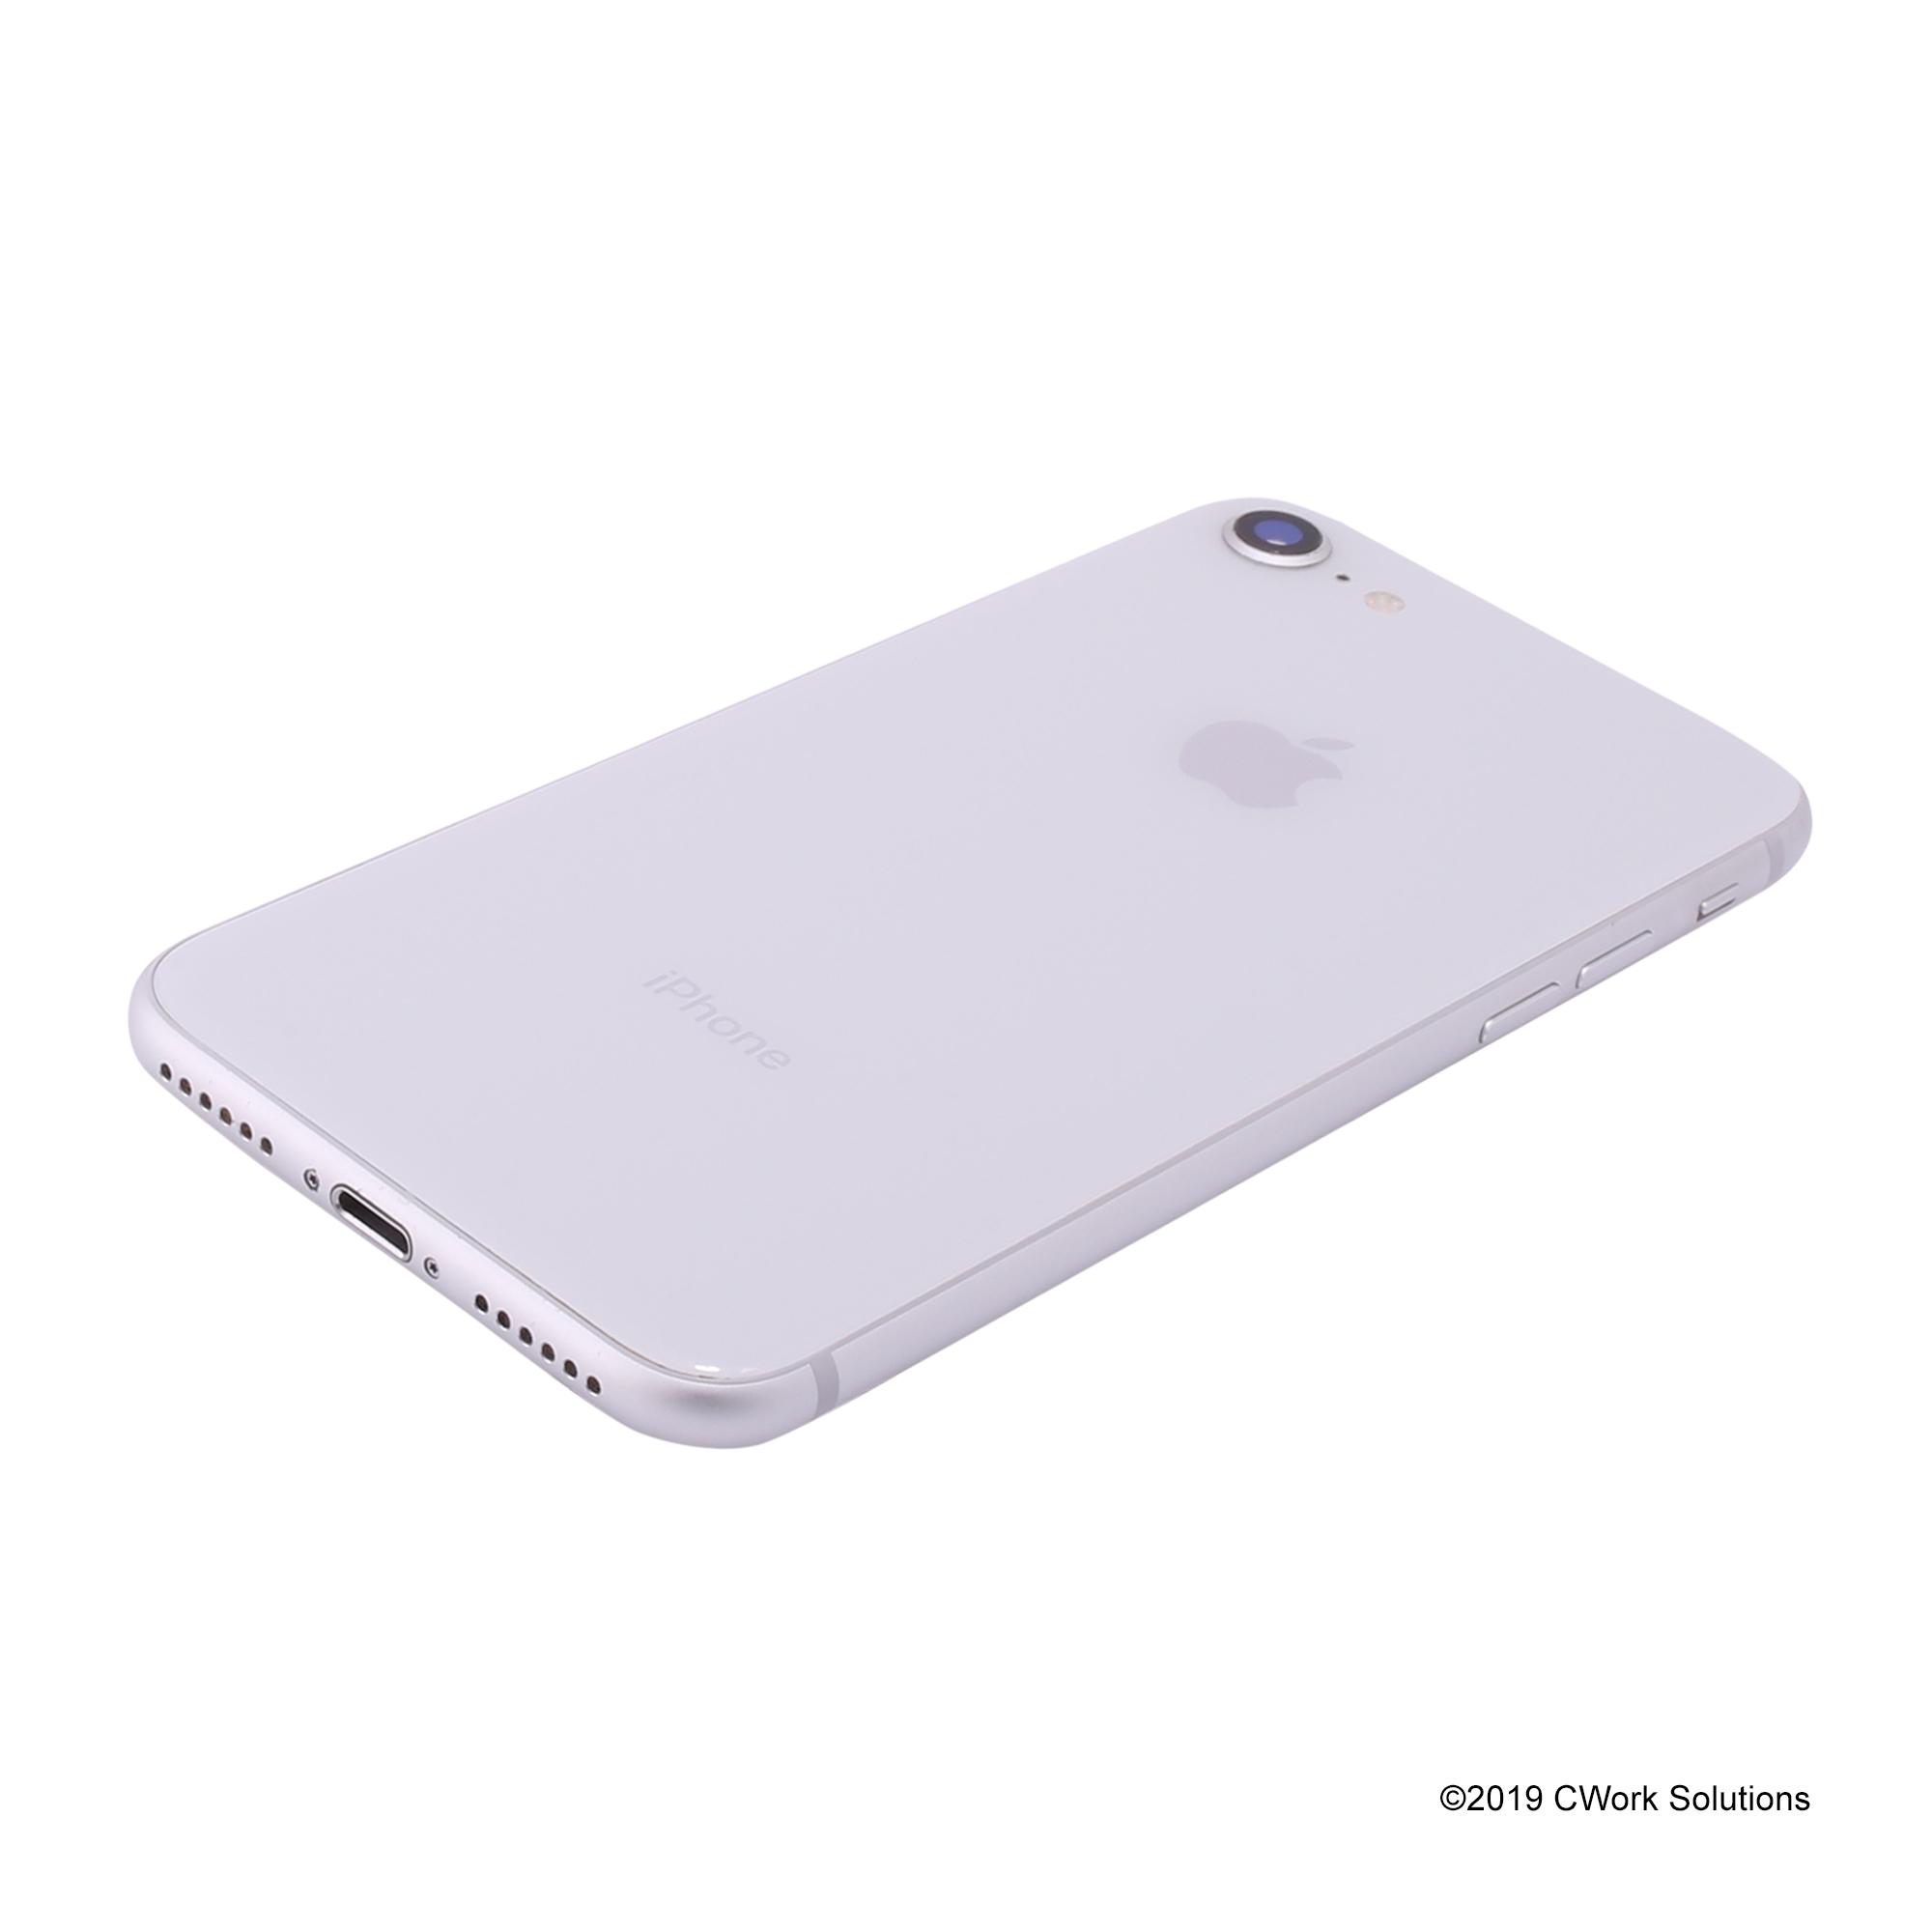 Apple-iPhone-8-a1863-64GB-Verizon-Unlocked-Excellent thumbnail 19